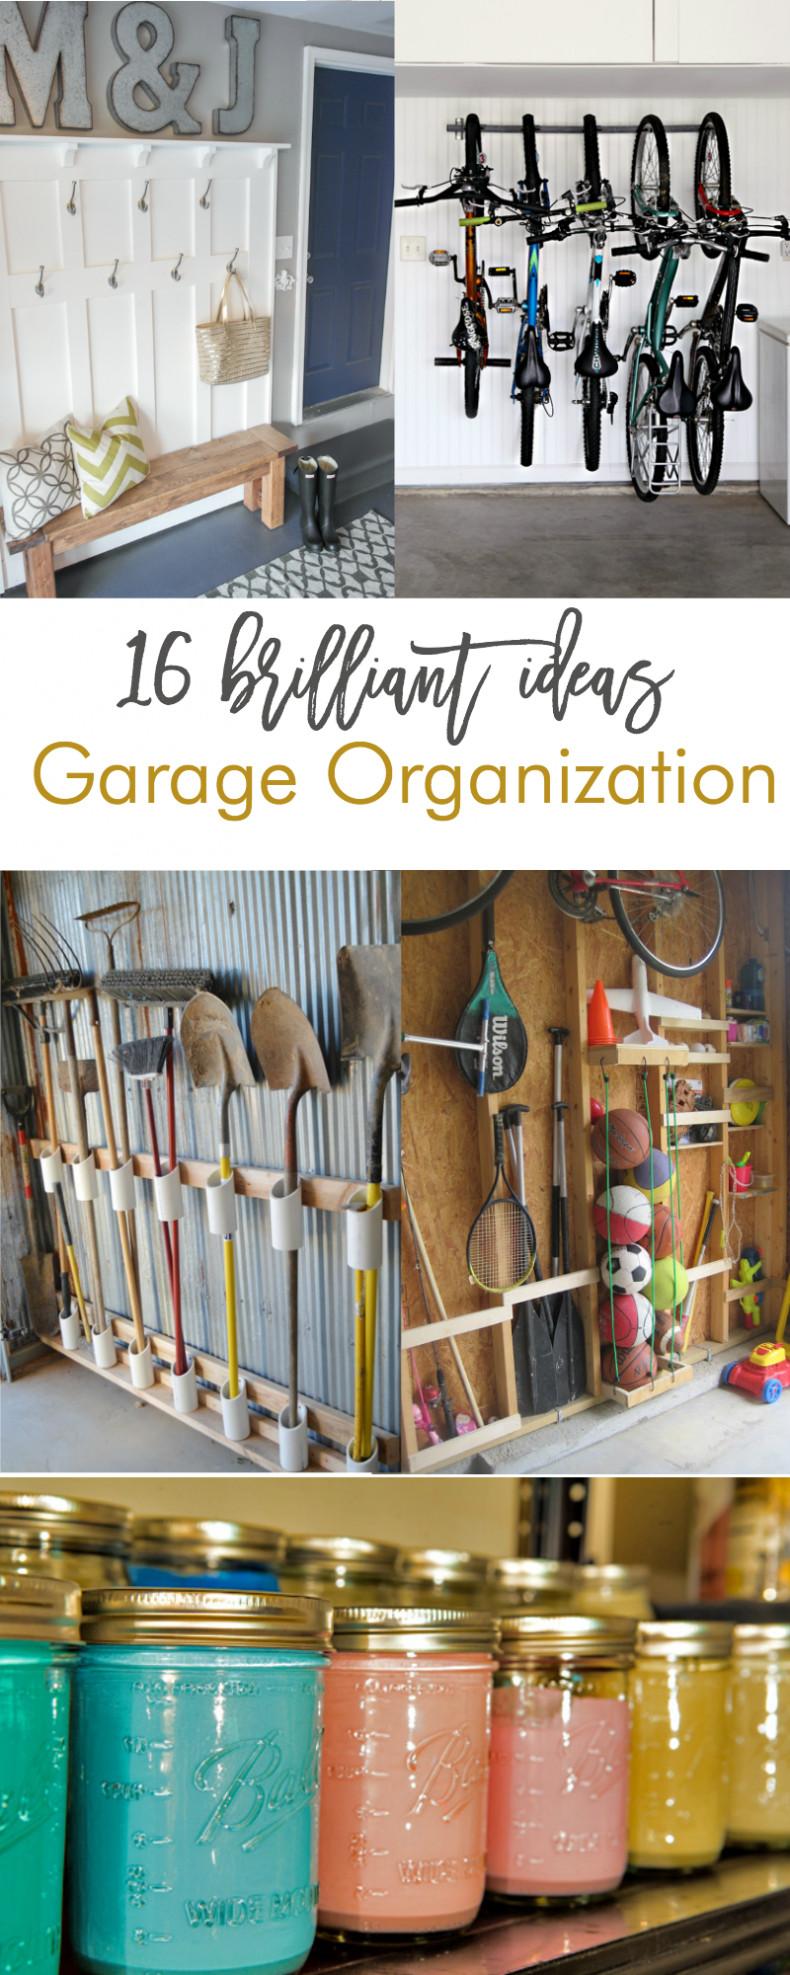 Best ideas about DIY Garage Ideas . Save or Pin 16 Brilliant DIY Garage Organization Ideas Now.